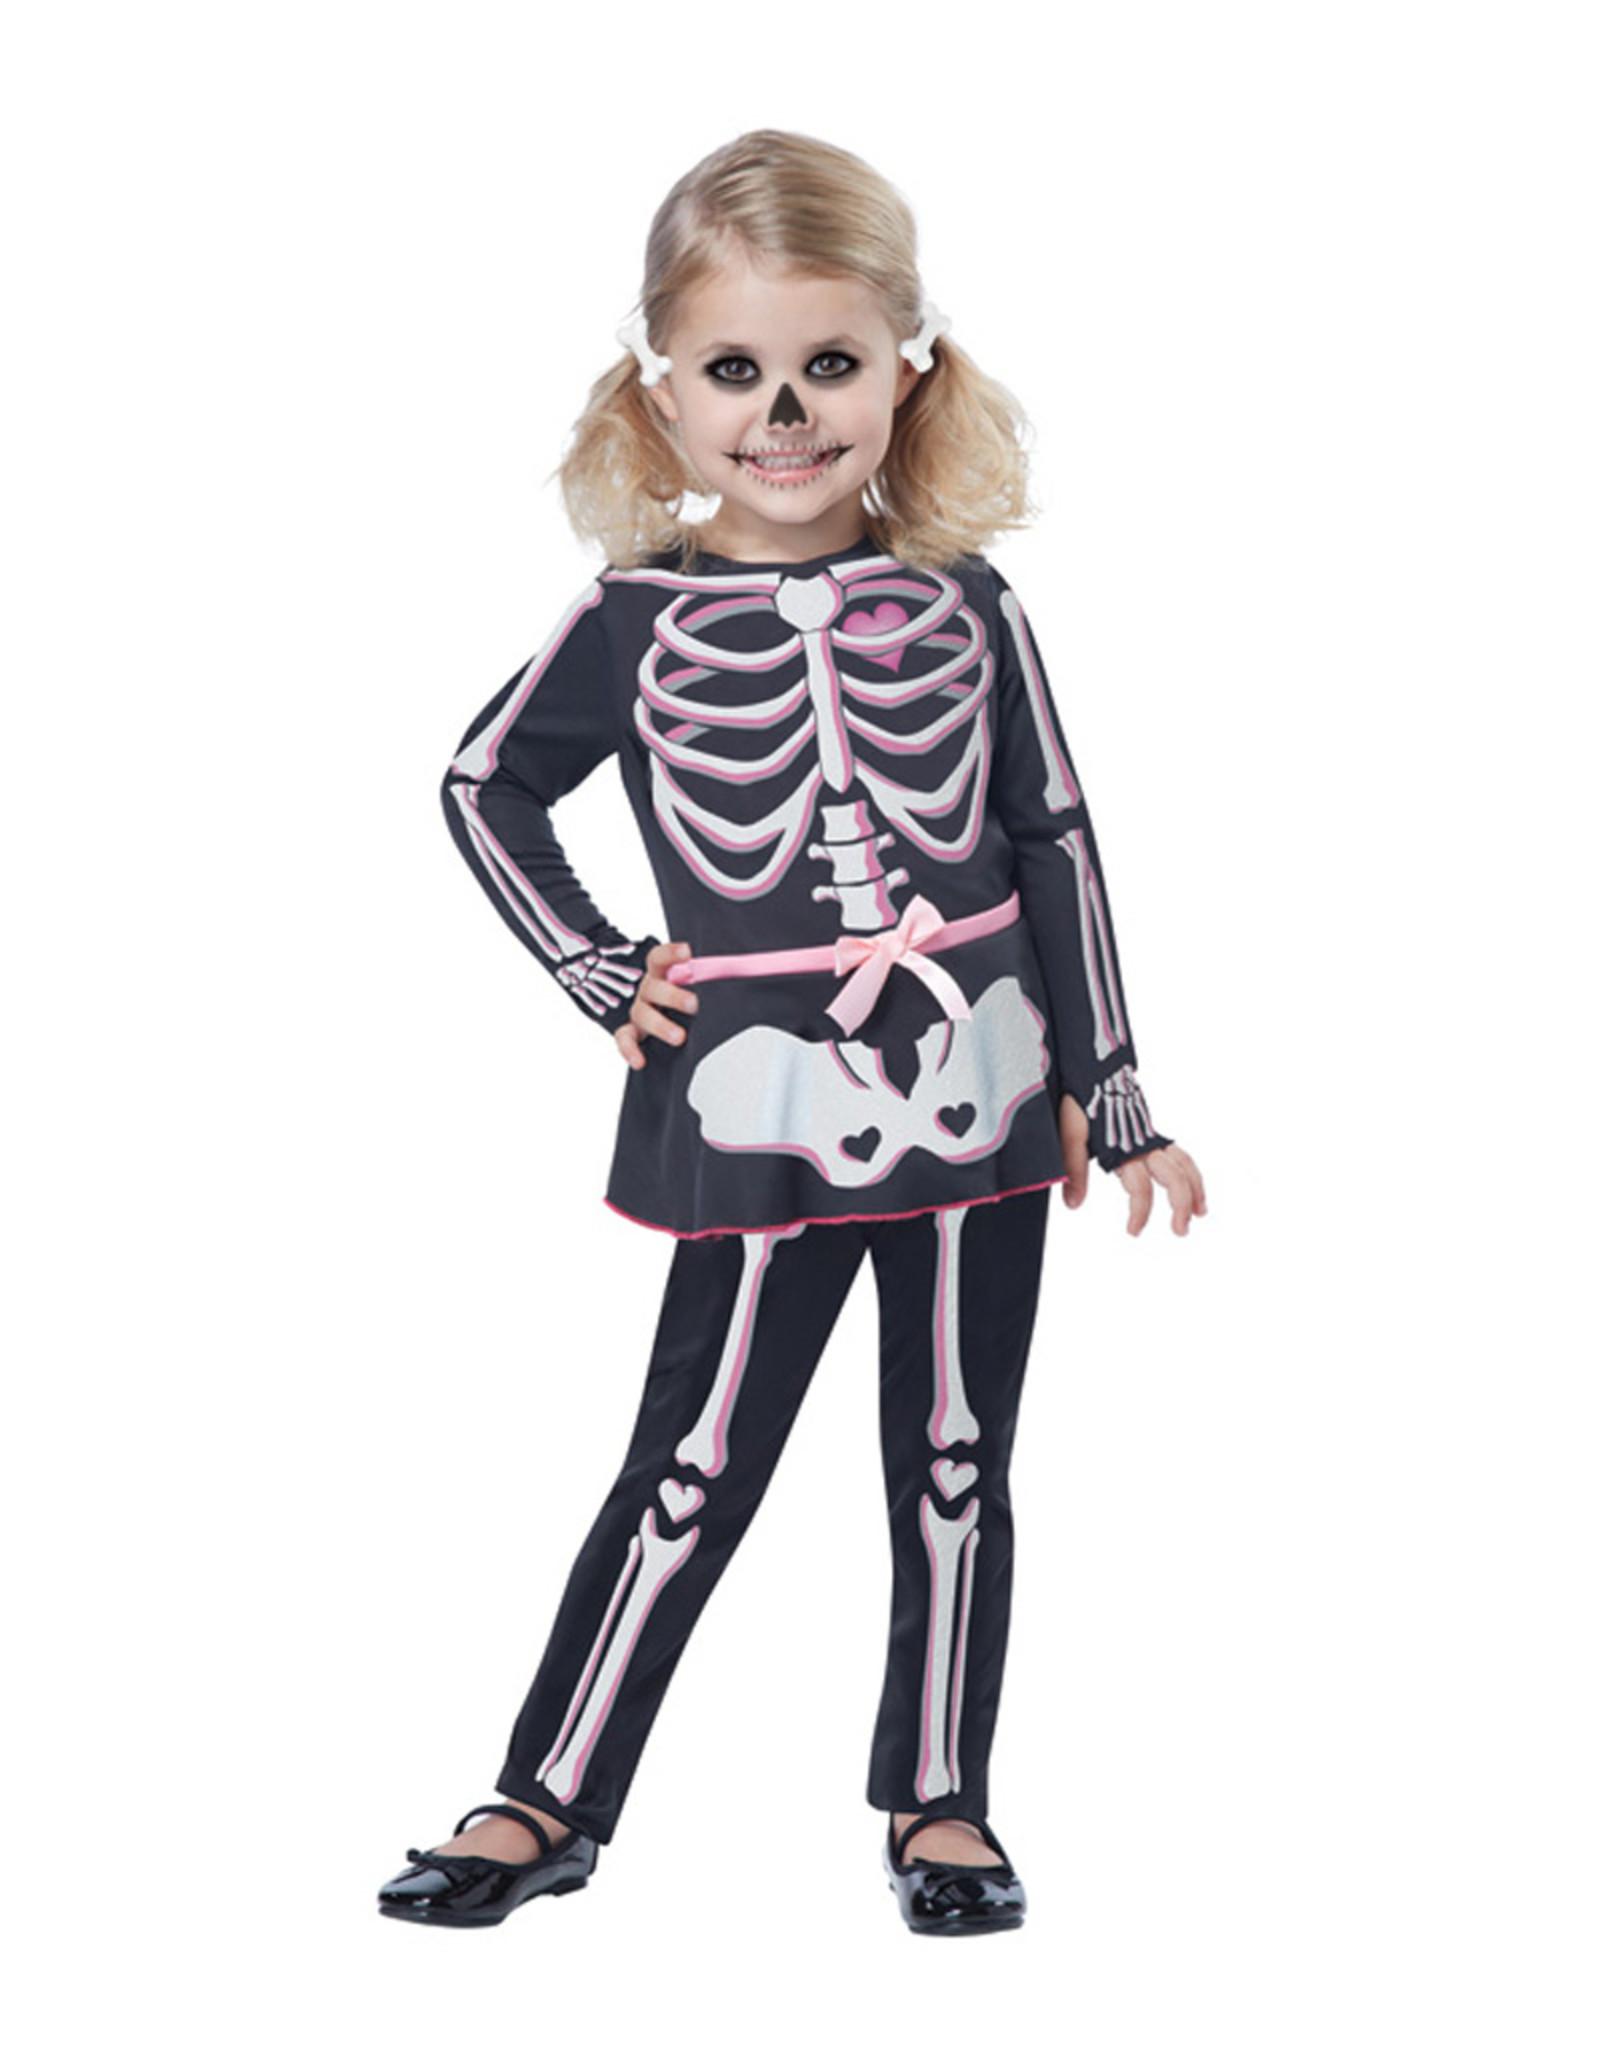 Itty Bitty Bones Costumes - Toddler